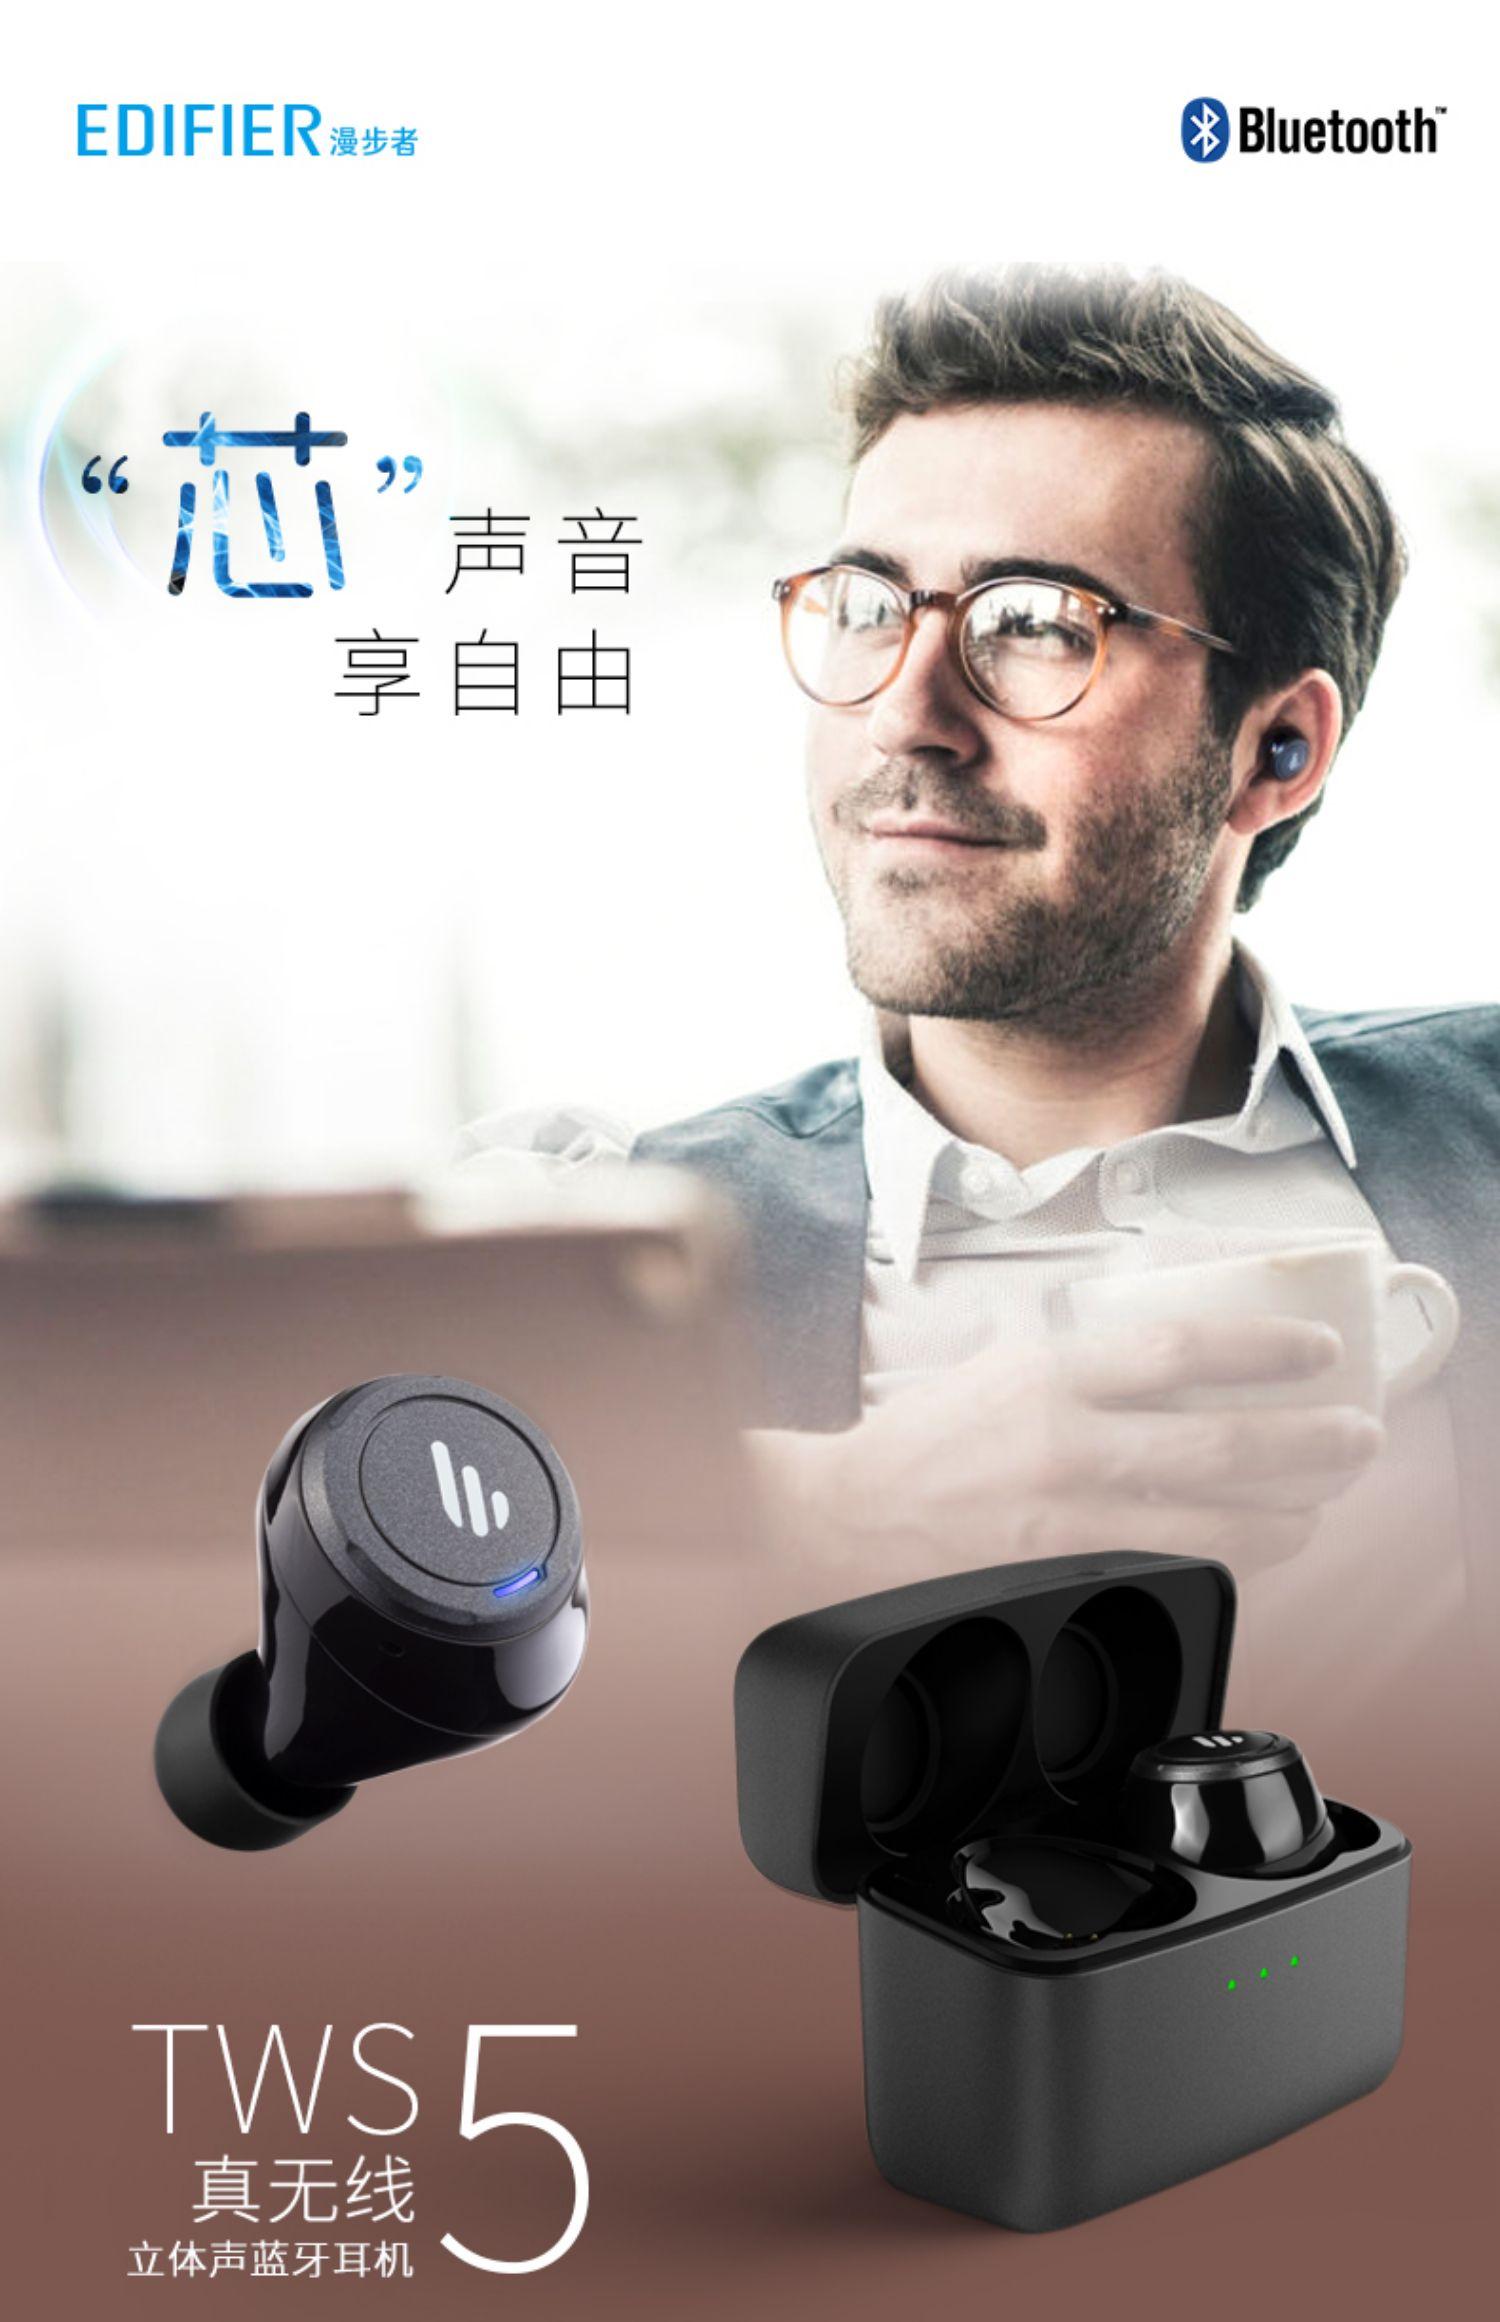 Edifier 漫步者 TWS5 Bluetooth Wireless Earbuds 蓝牙5.0 降噪 防溅 无线耳机